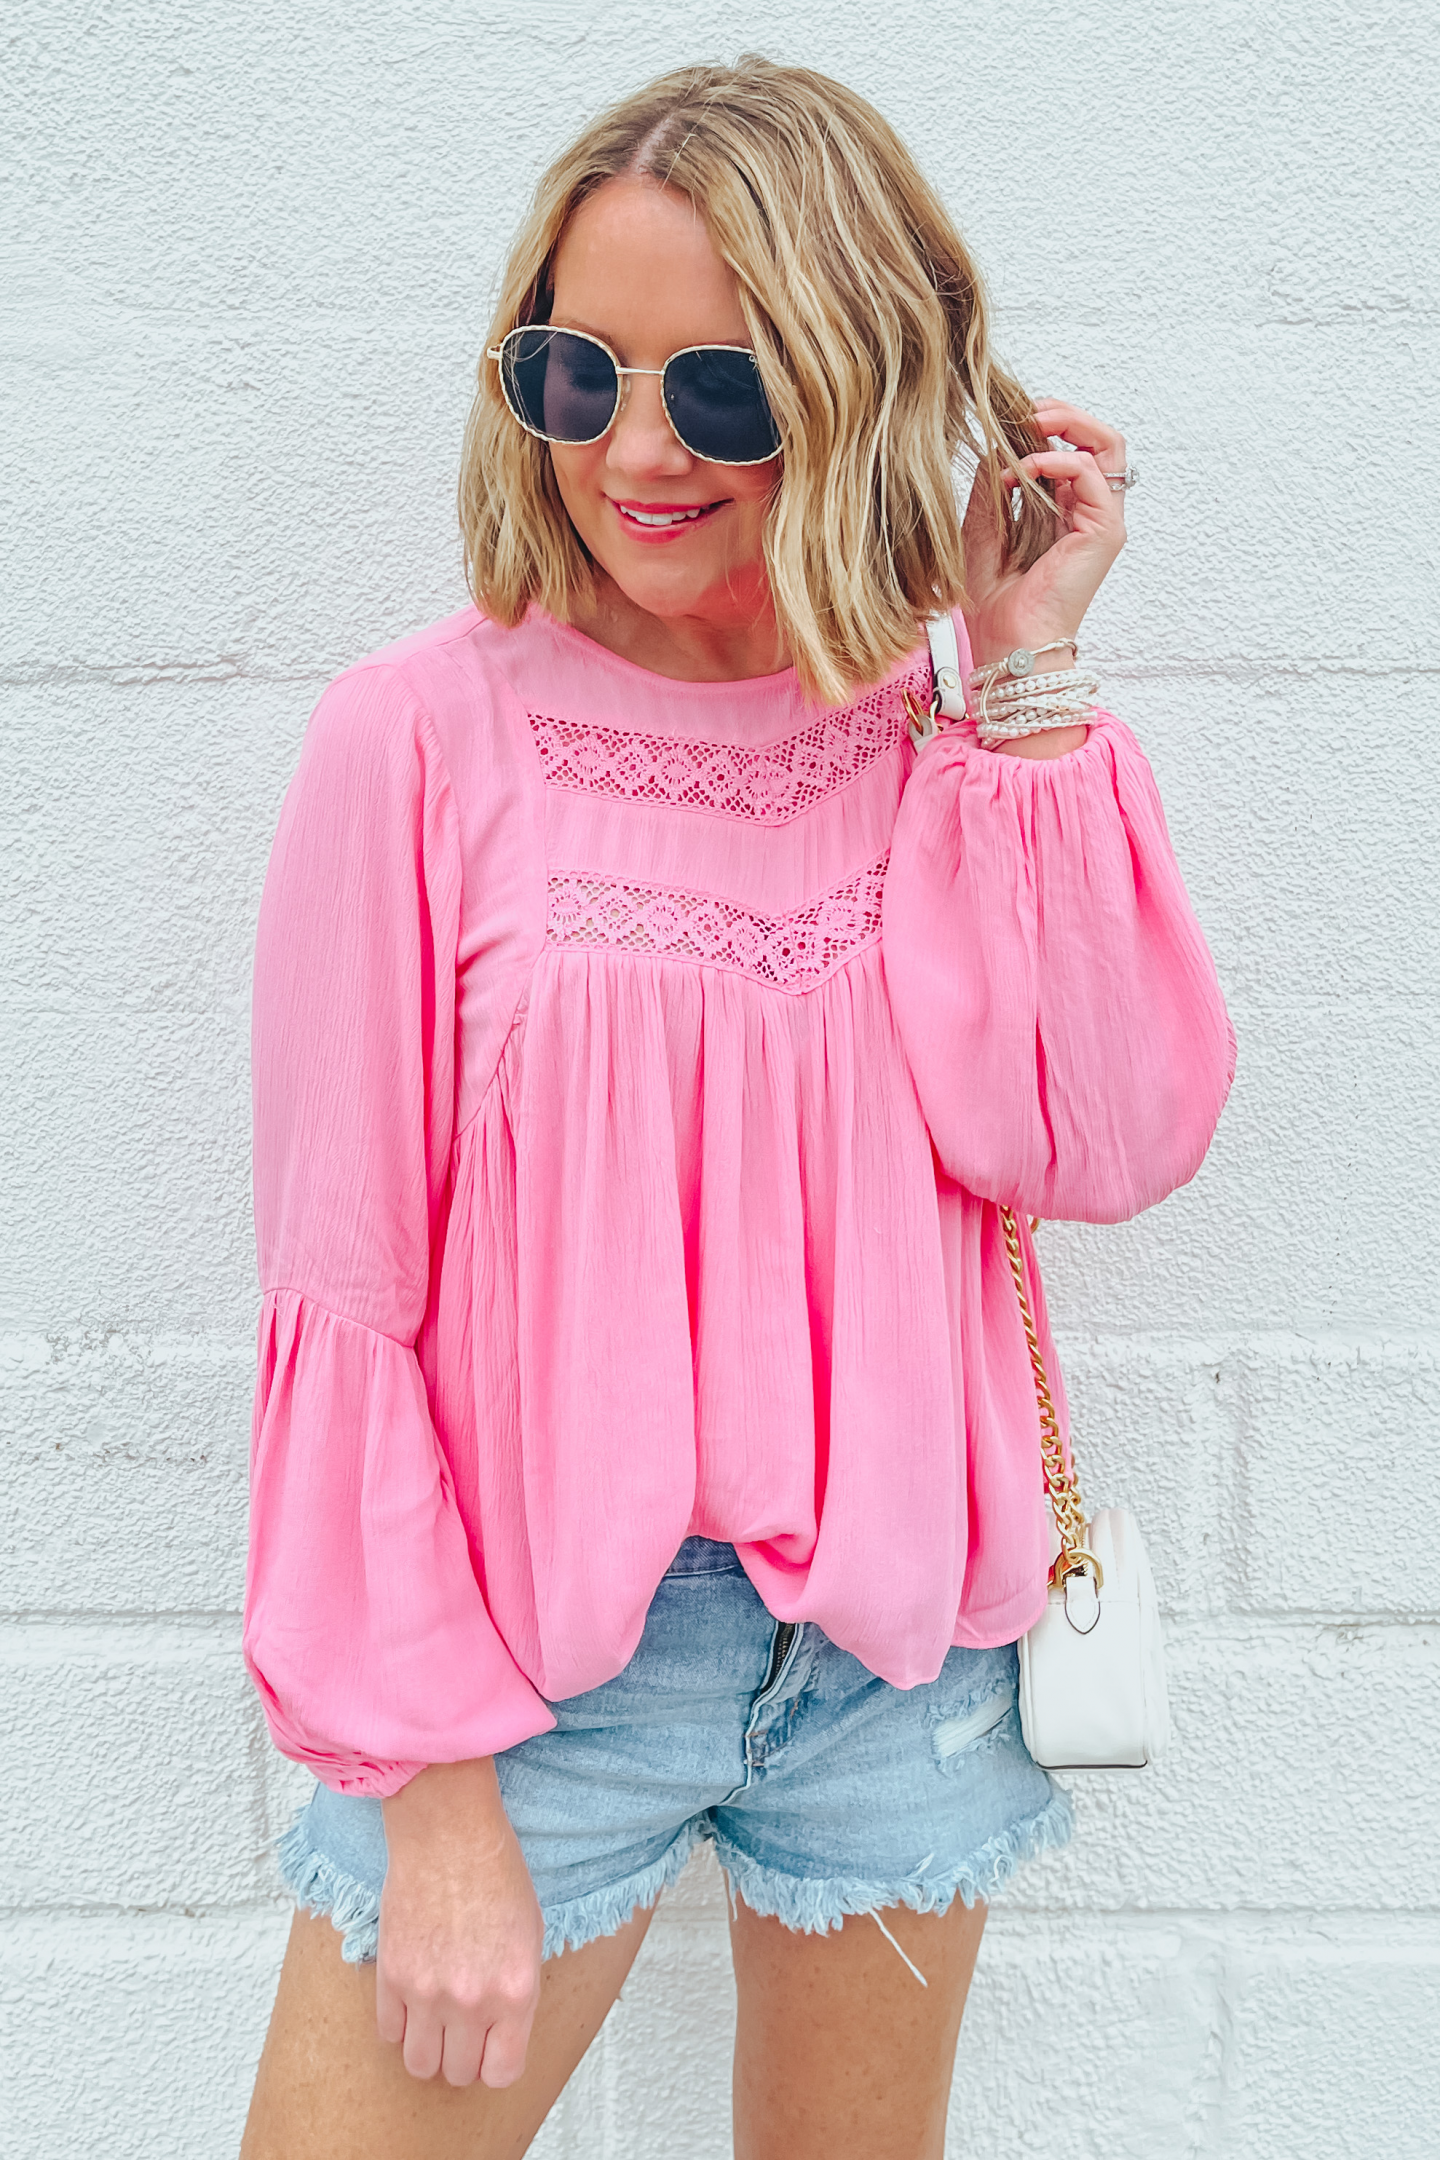 Five Ways to Style Denim Shorts, Scoop cutoff shorts, Scoop boho blouse